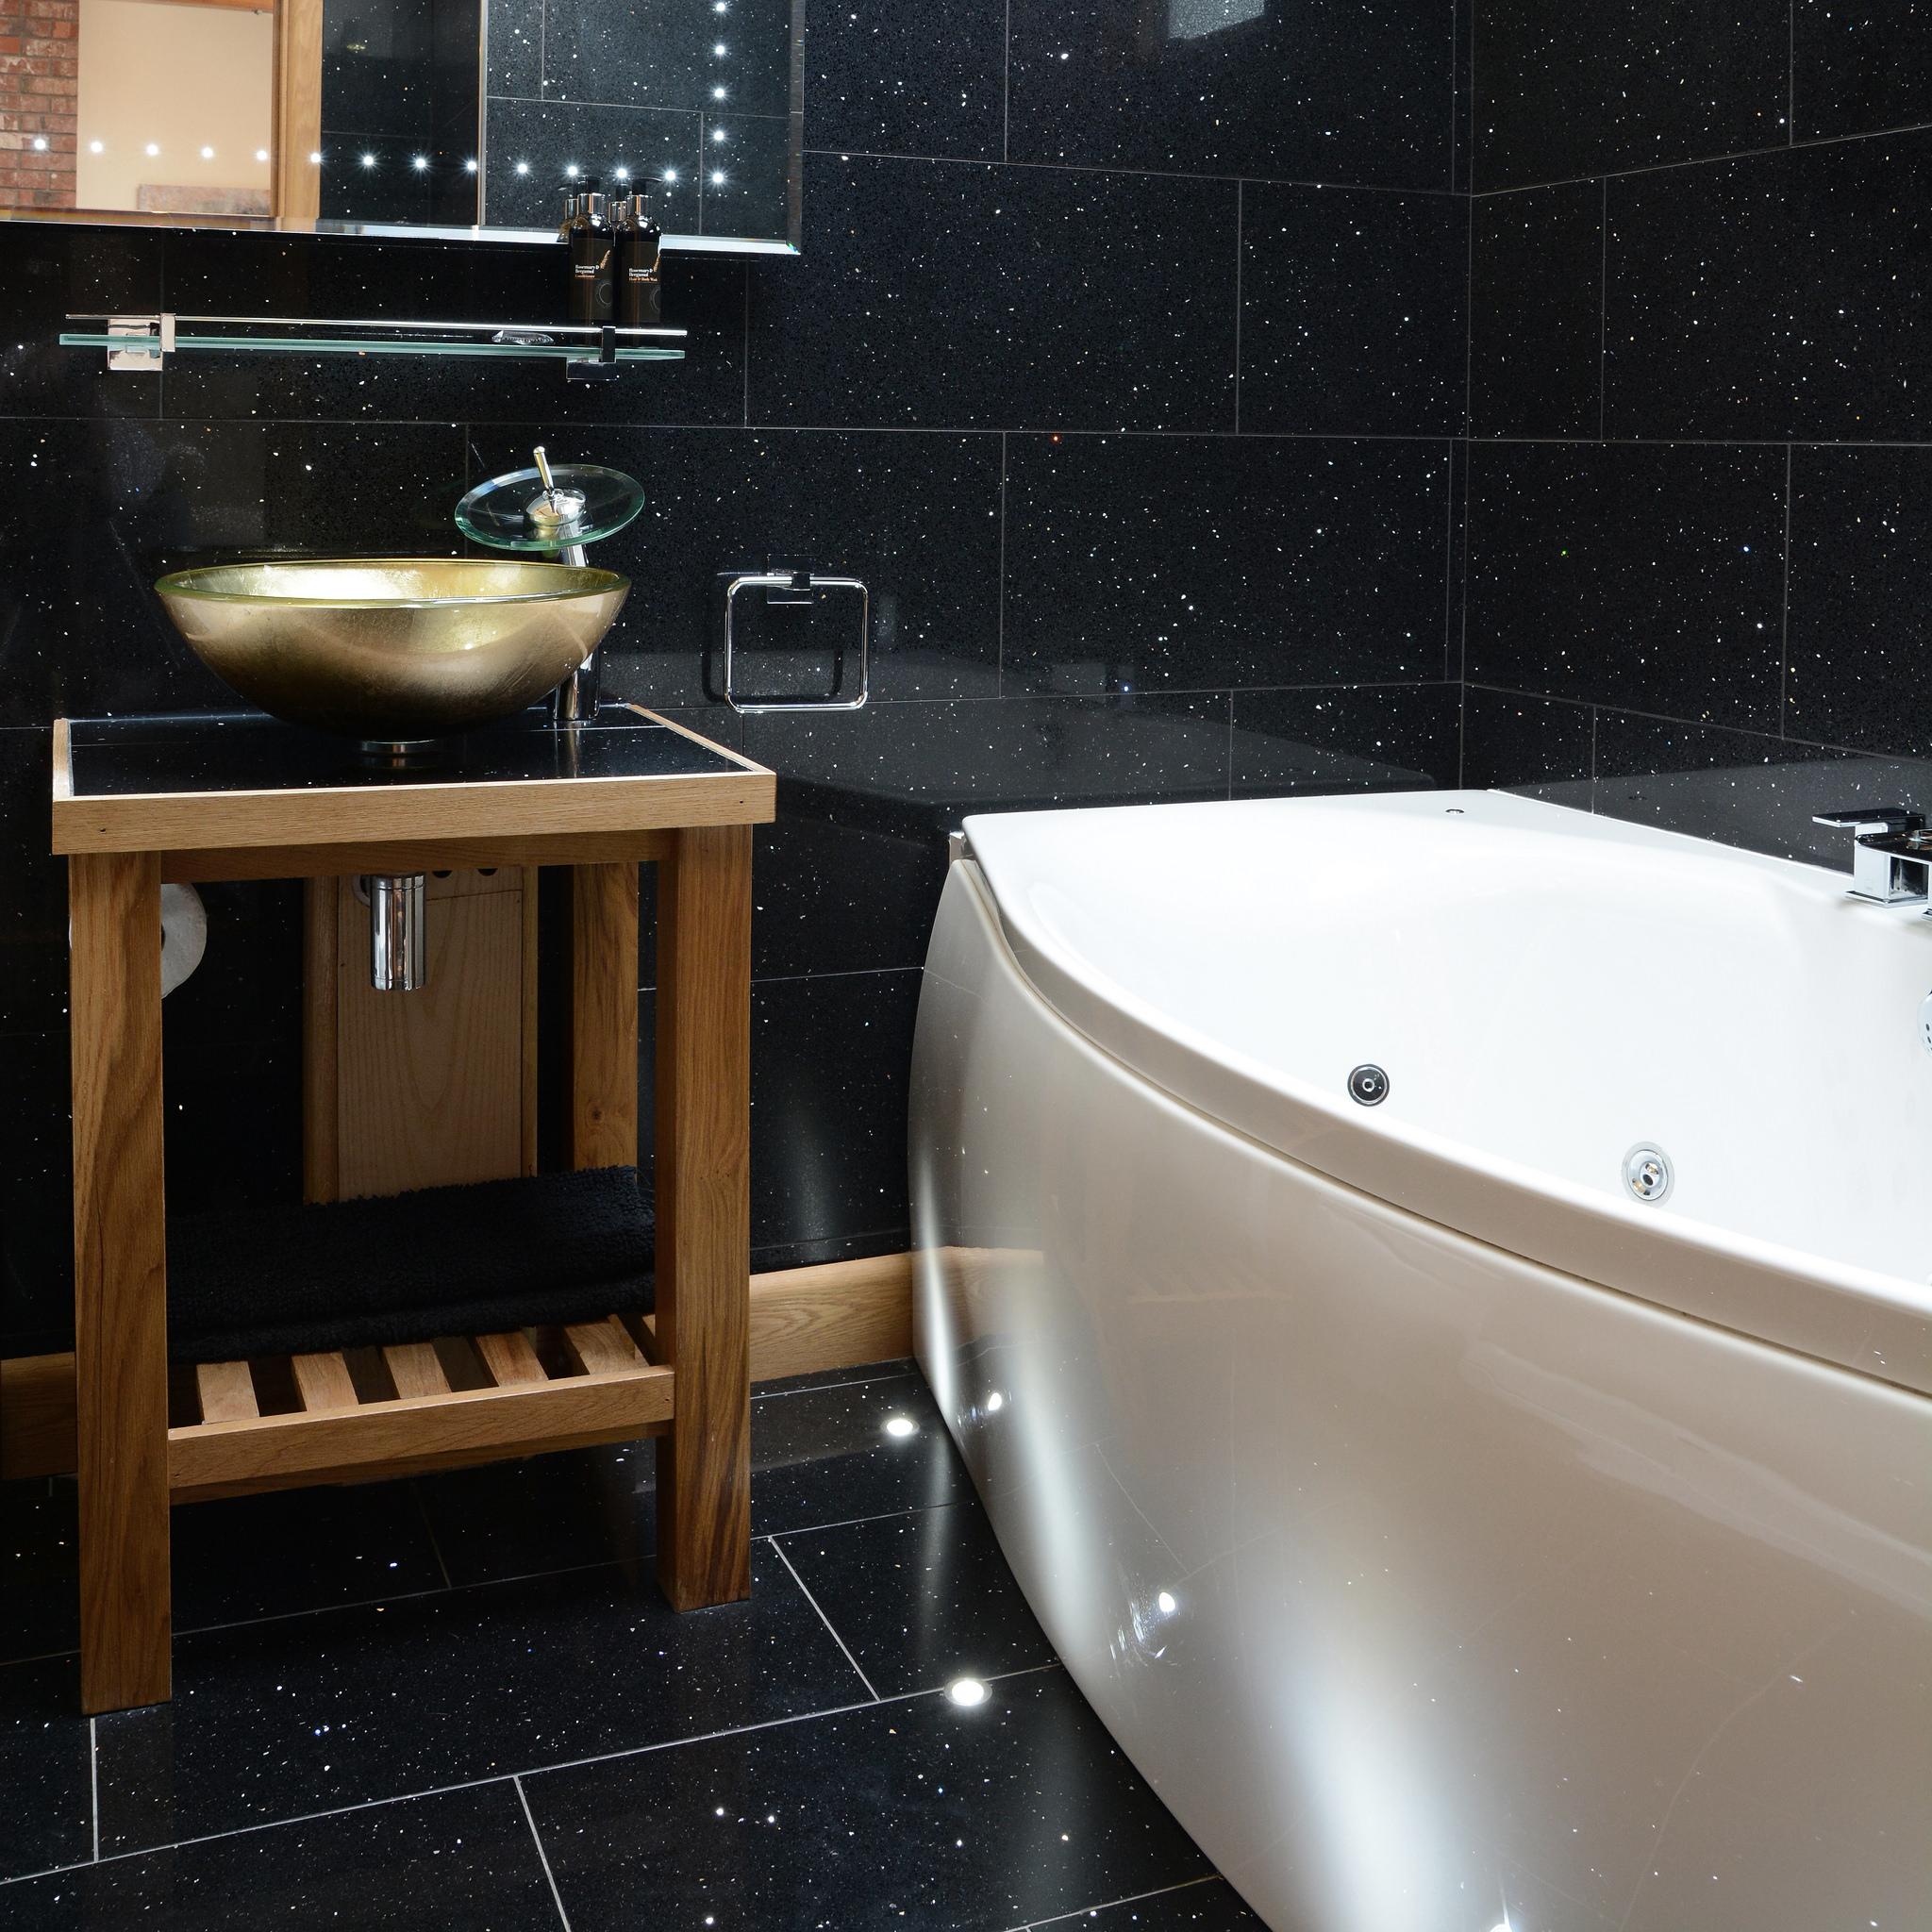 Spa bath and feature sink in the en-suite bathroom of Milky Way